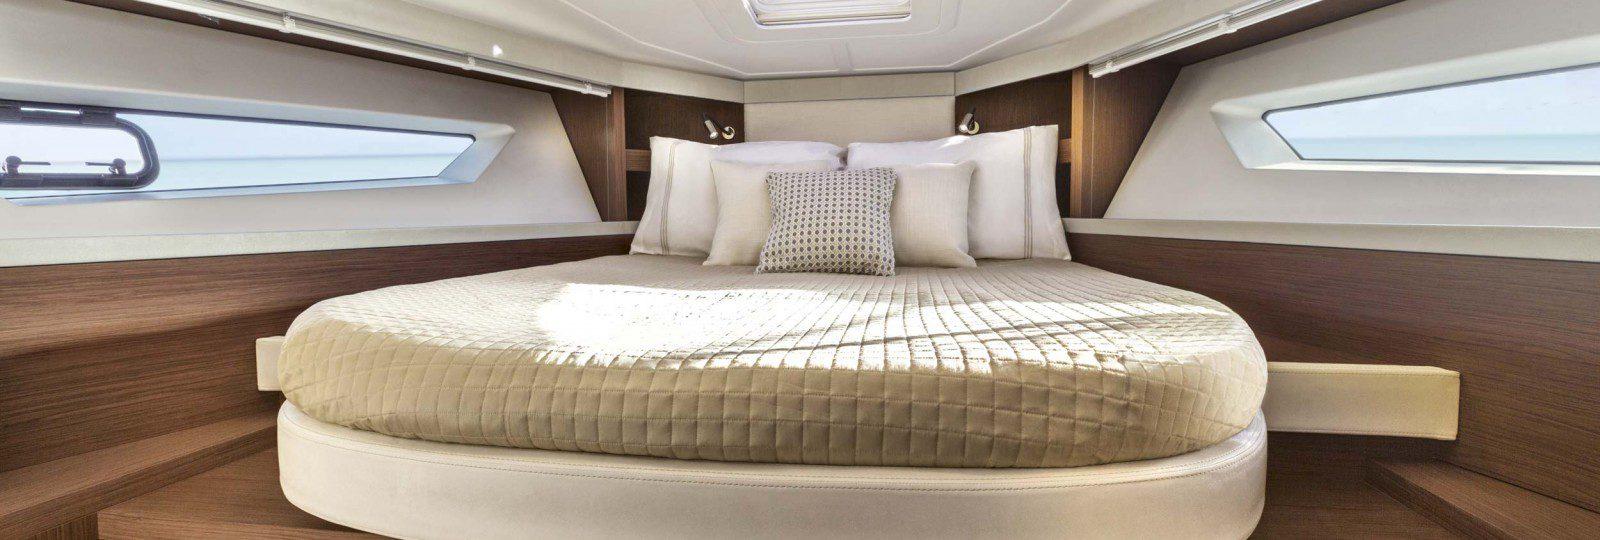 Beneteau Gran Turismo 40 master cabin